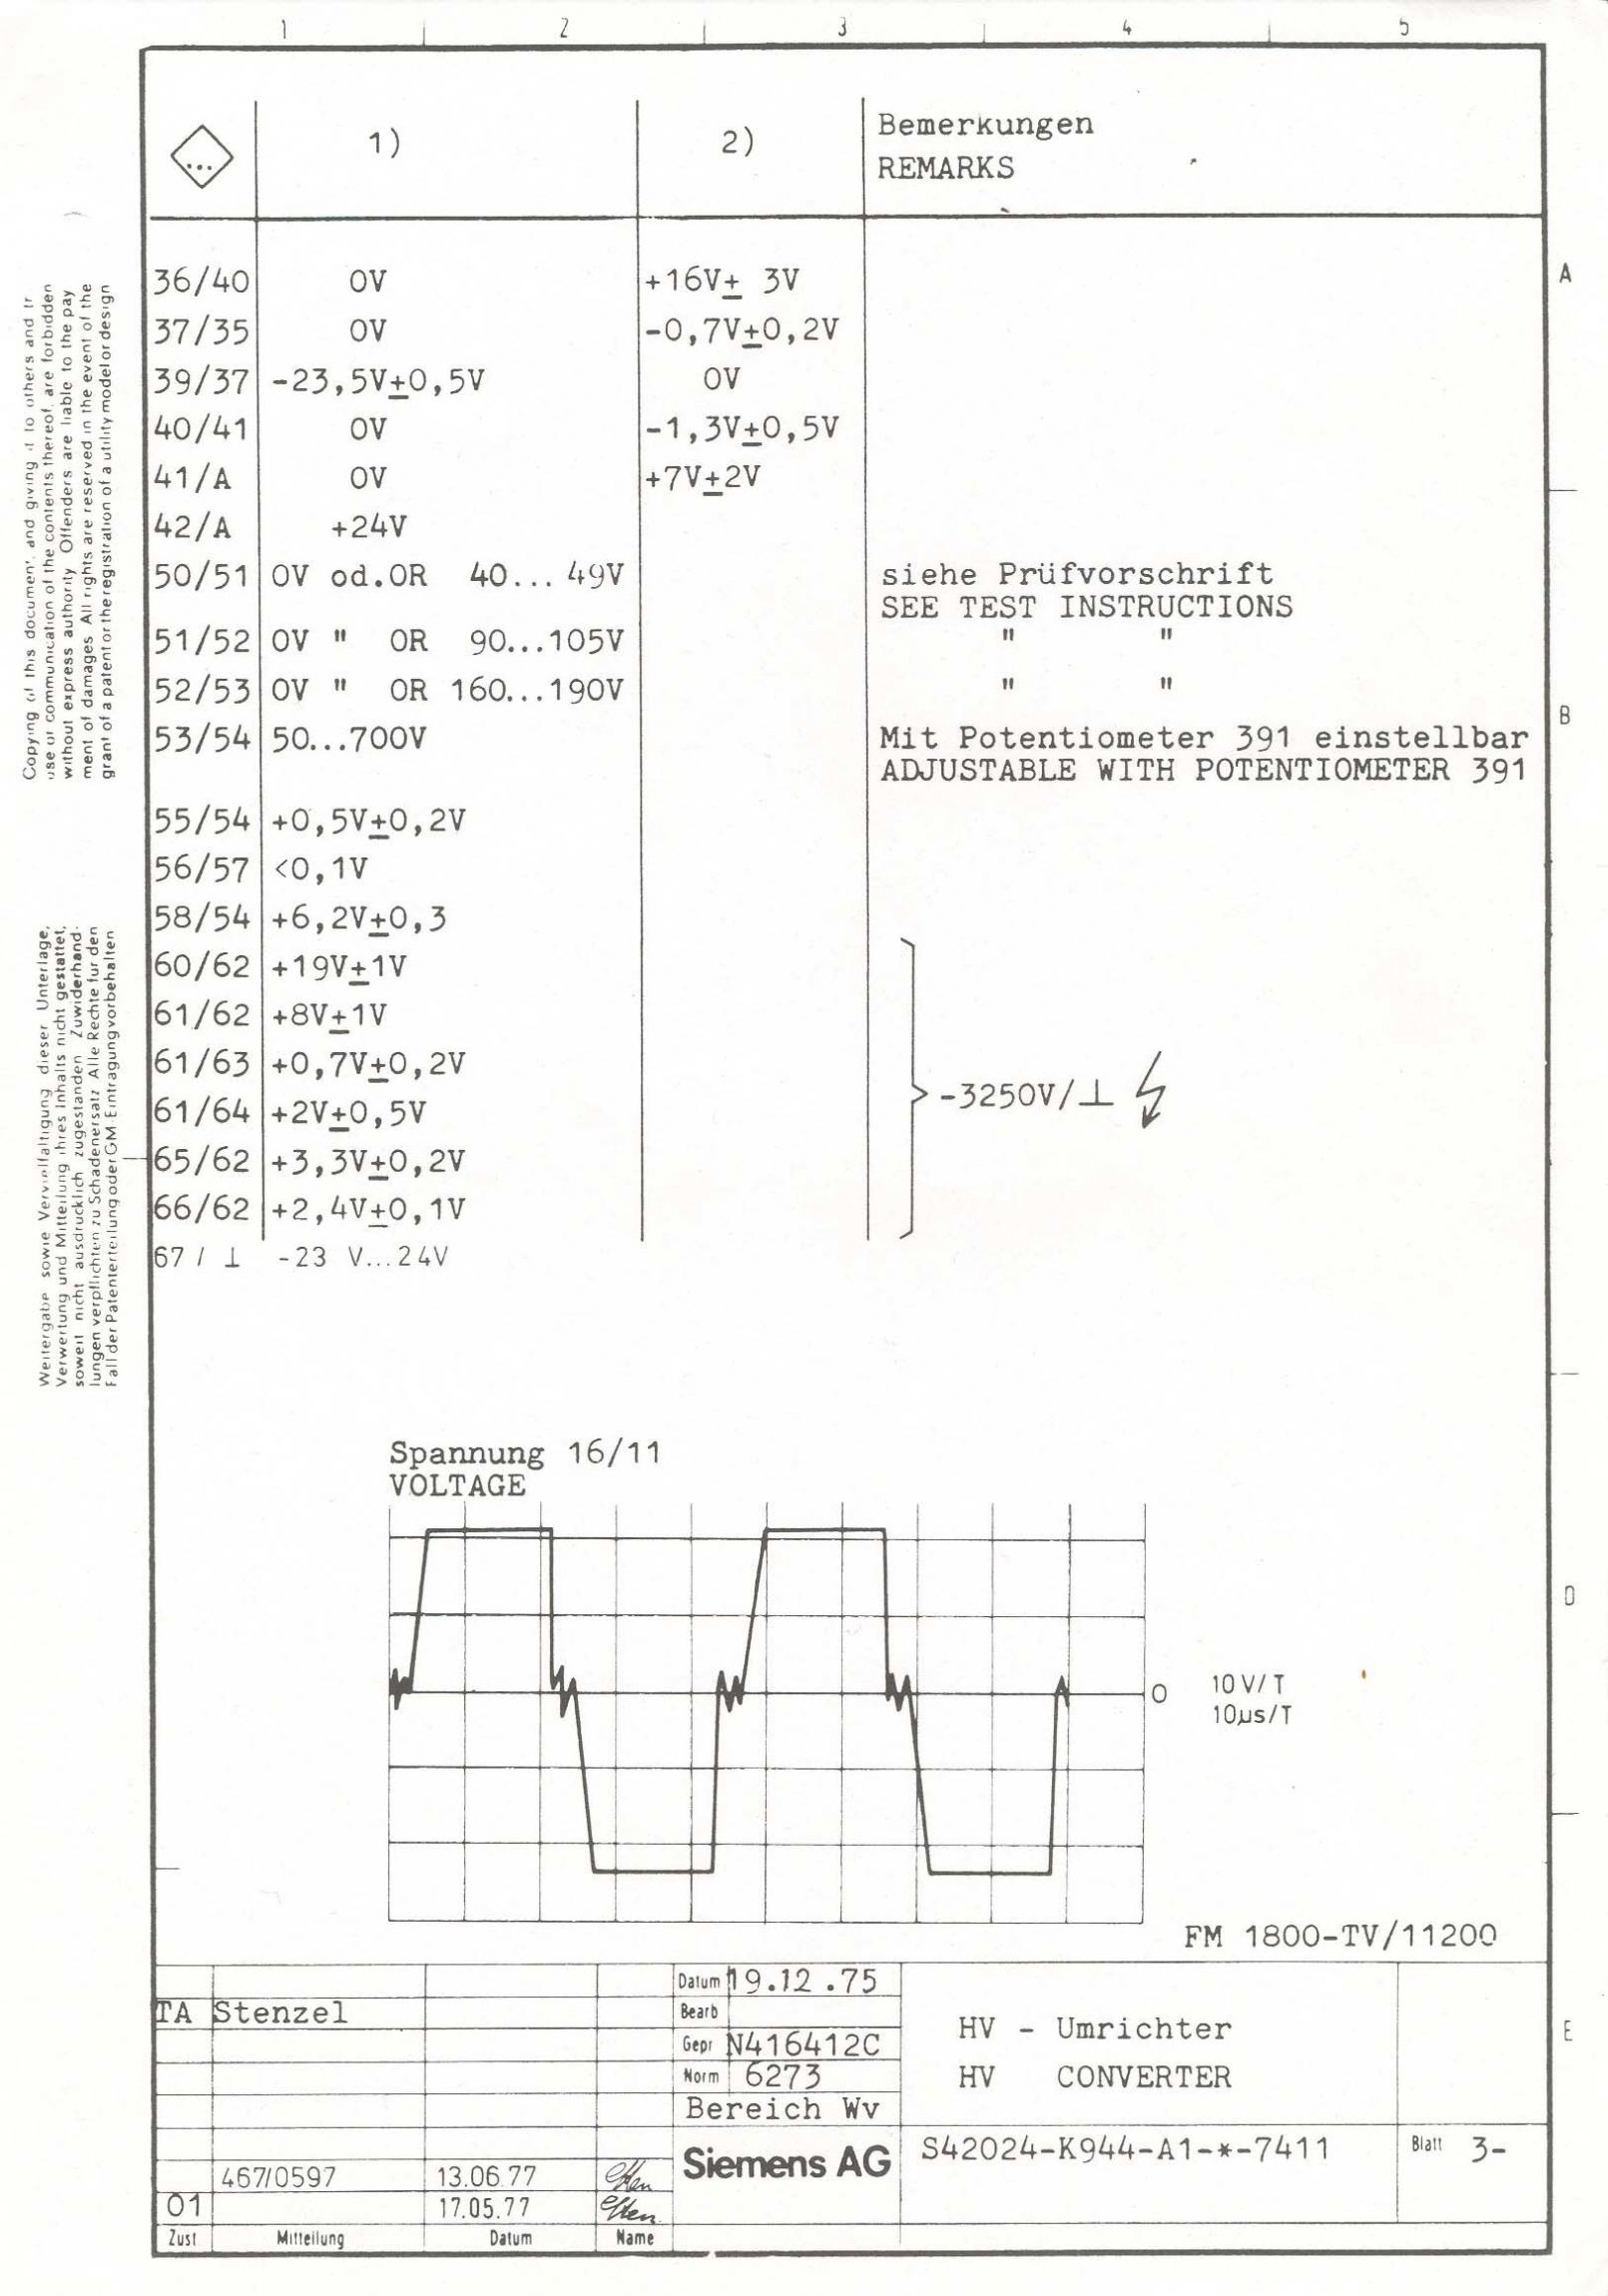 Holiday Rambler Wiring Diagram | Manual E-Books - Holiday Rambler Wiring Diagram